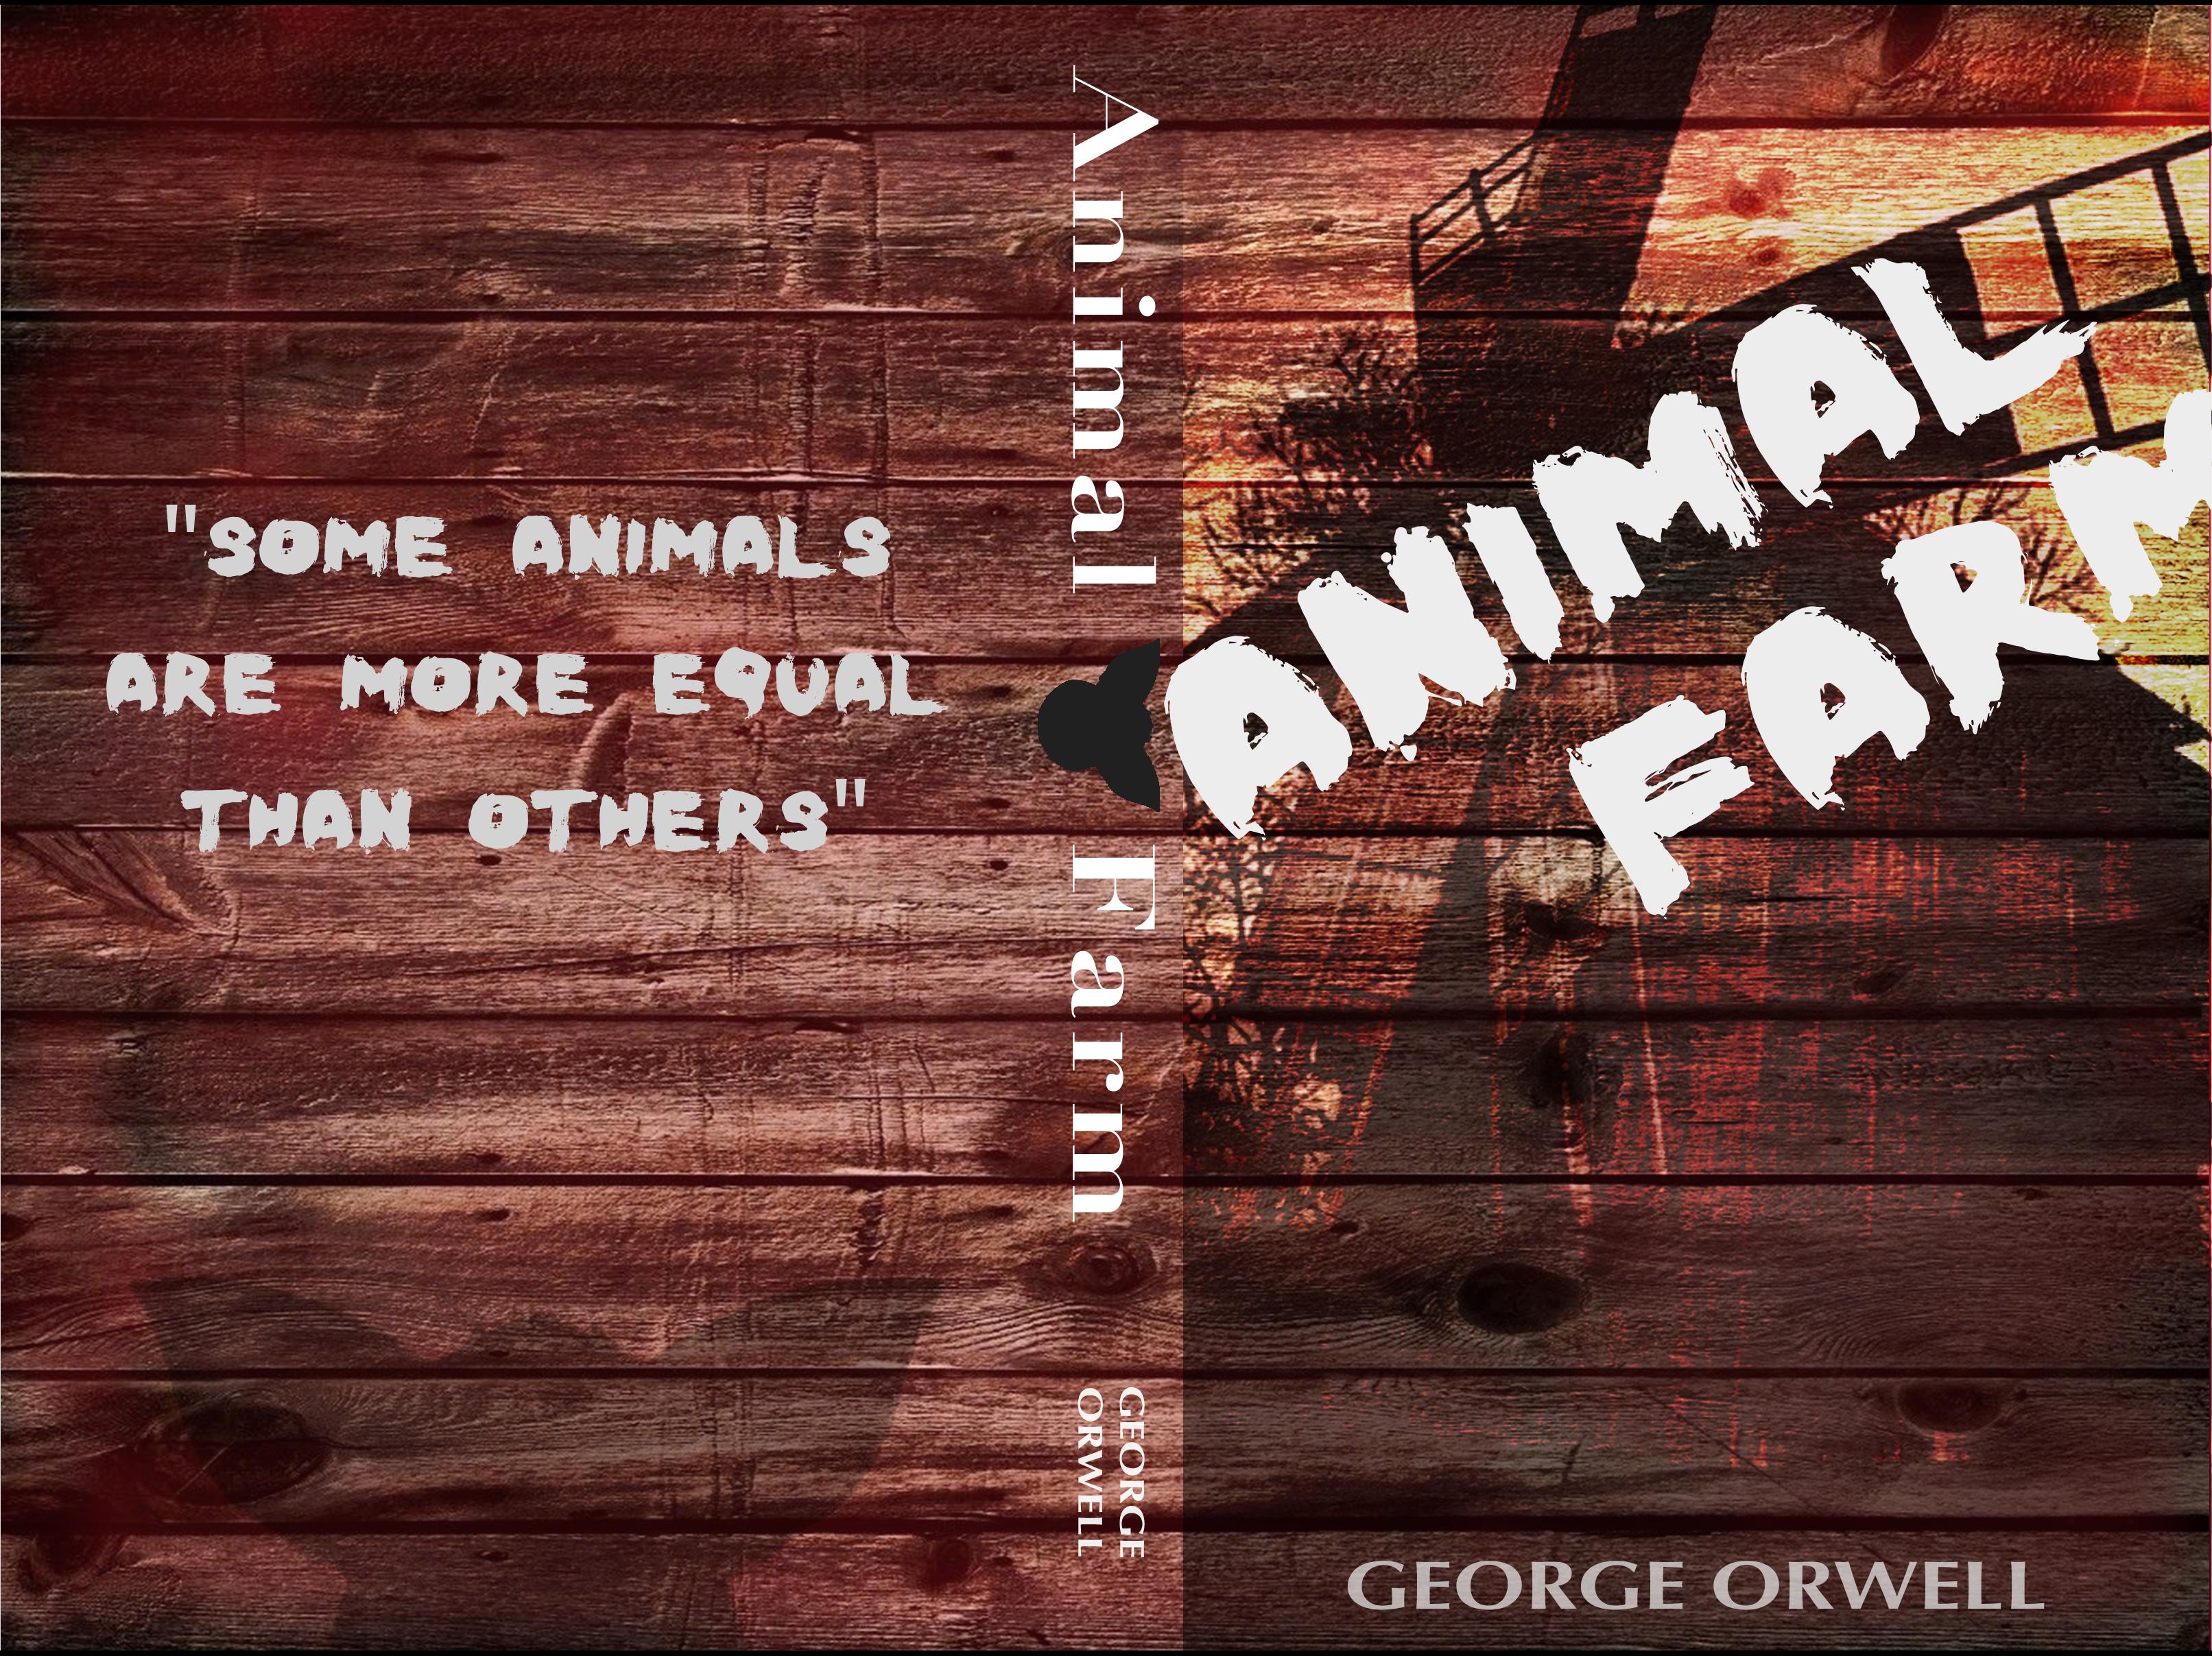 Joshua Moe Animal Farm Book Cover